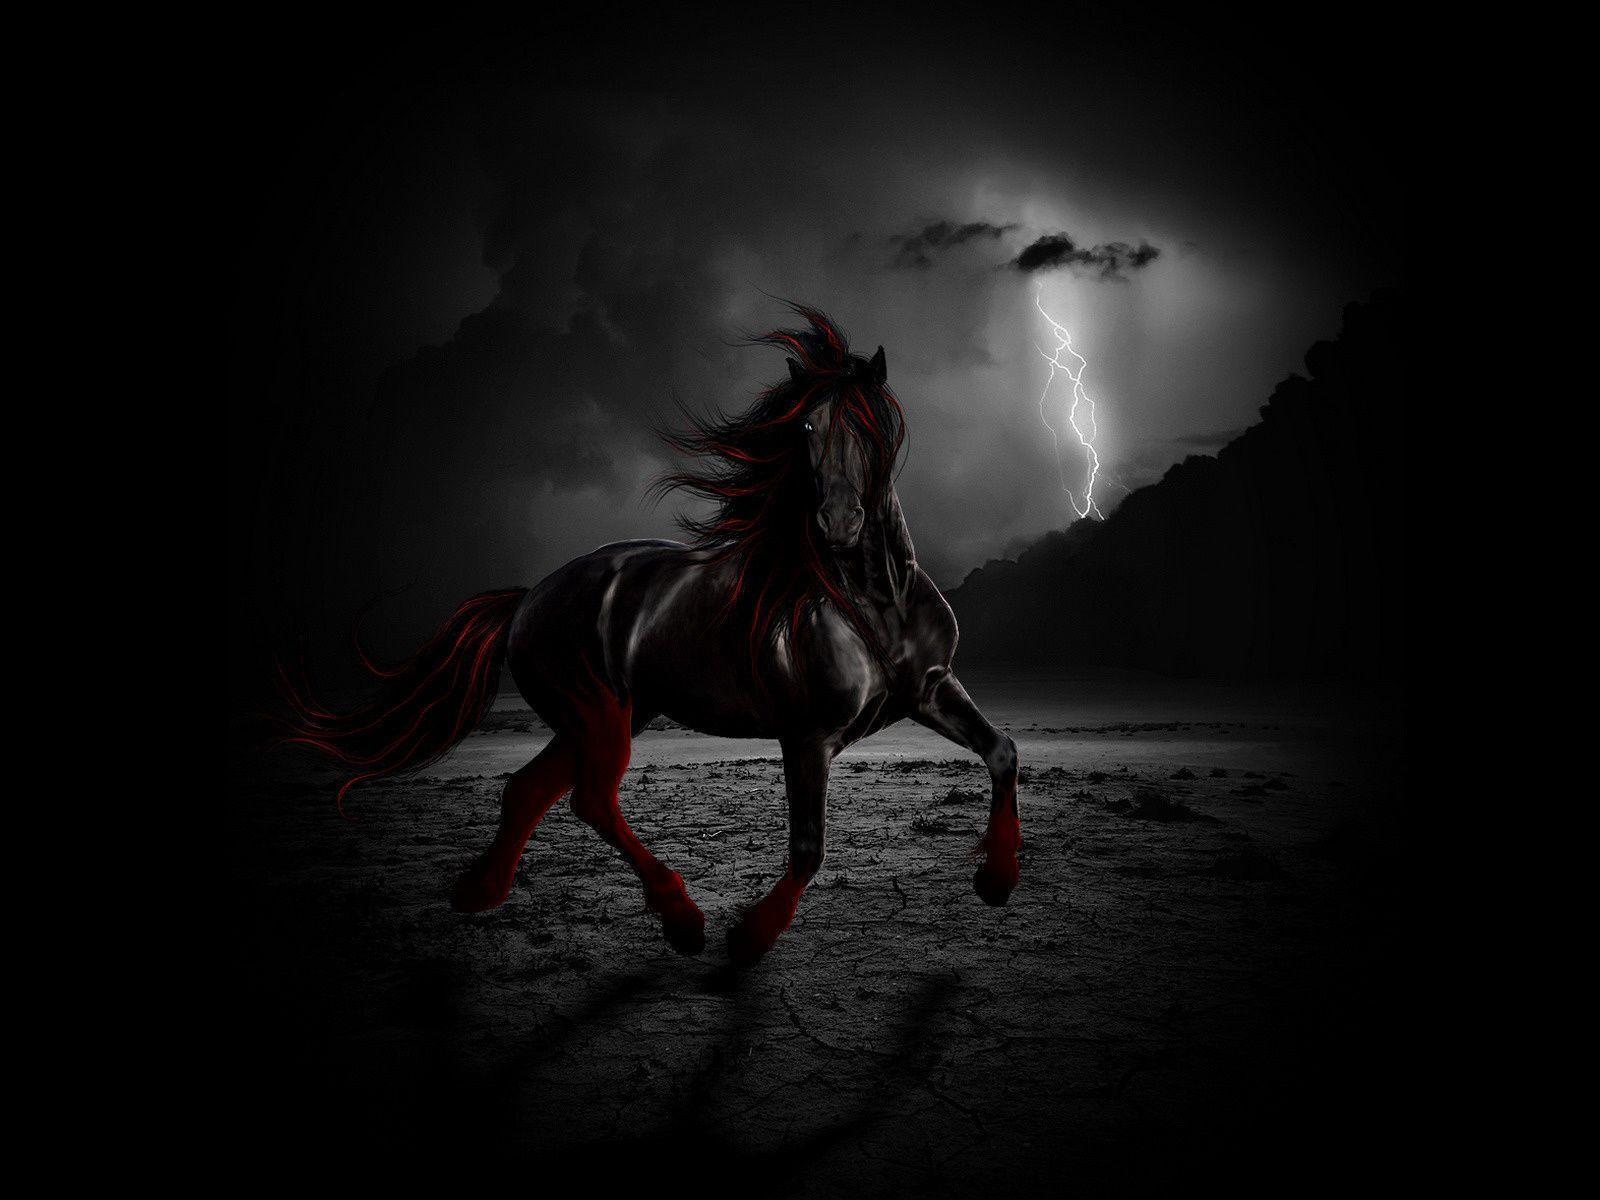 Black Horse Wallpapers - Wallpaper Cave - photo#18